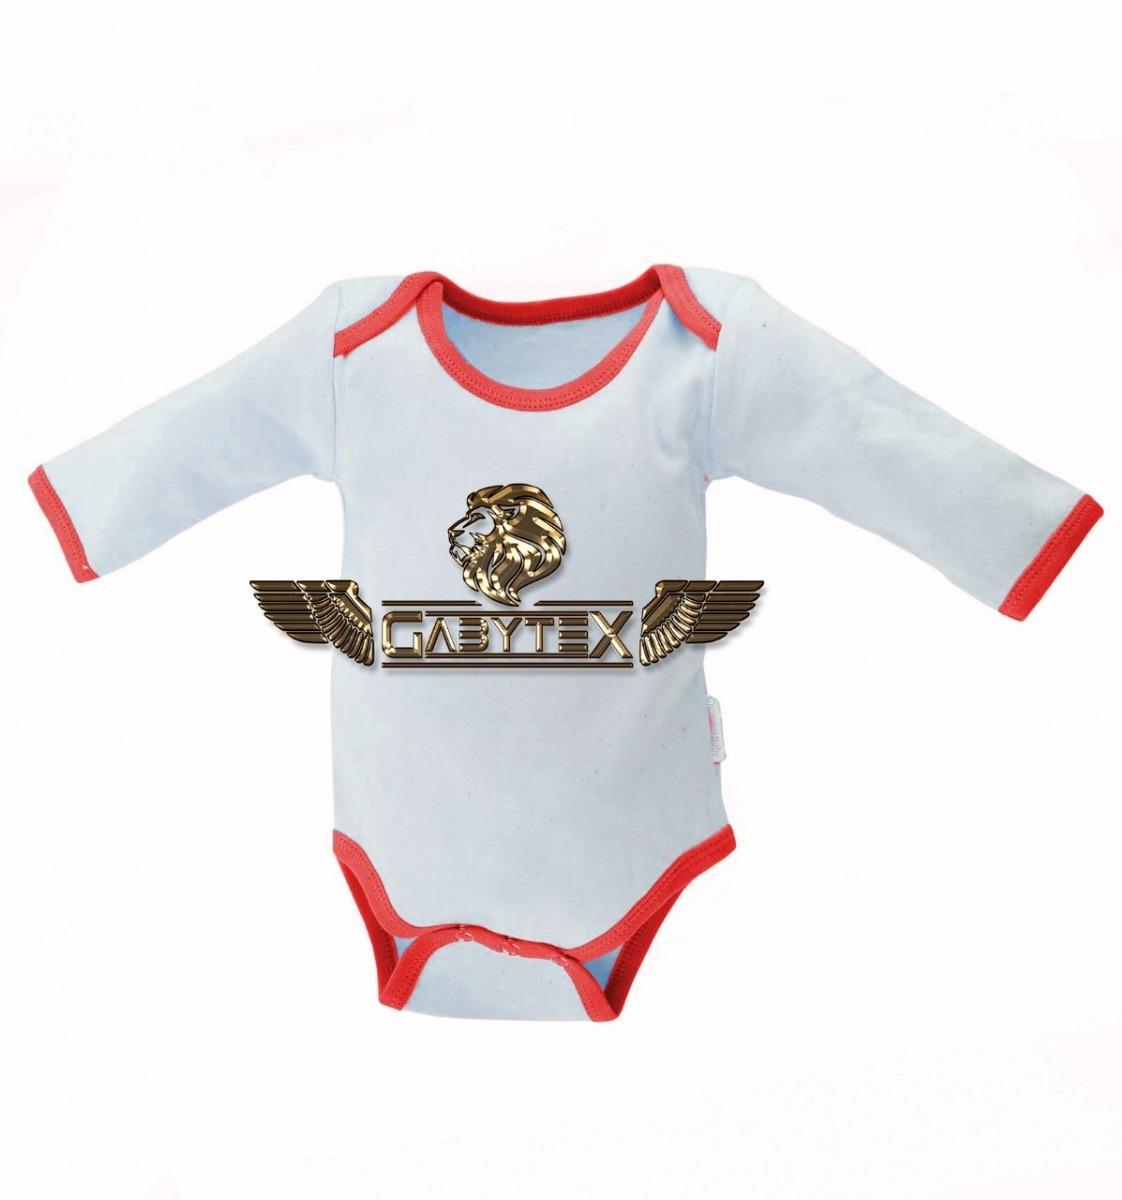 b7ec6fdaa Bodys De Bebe 100% Polyester Para Sublimar - $ 64,99 en Mercado Libre